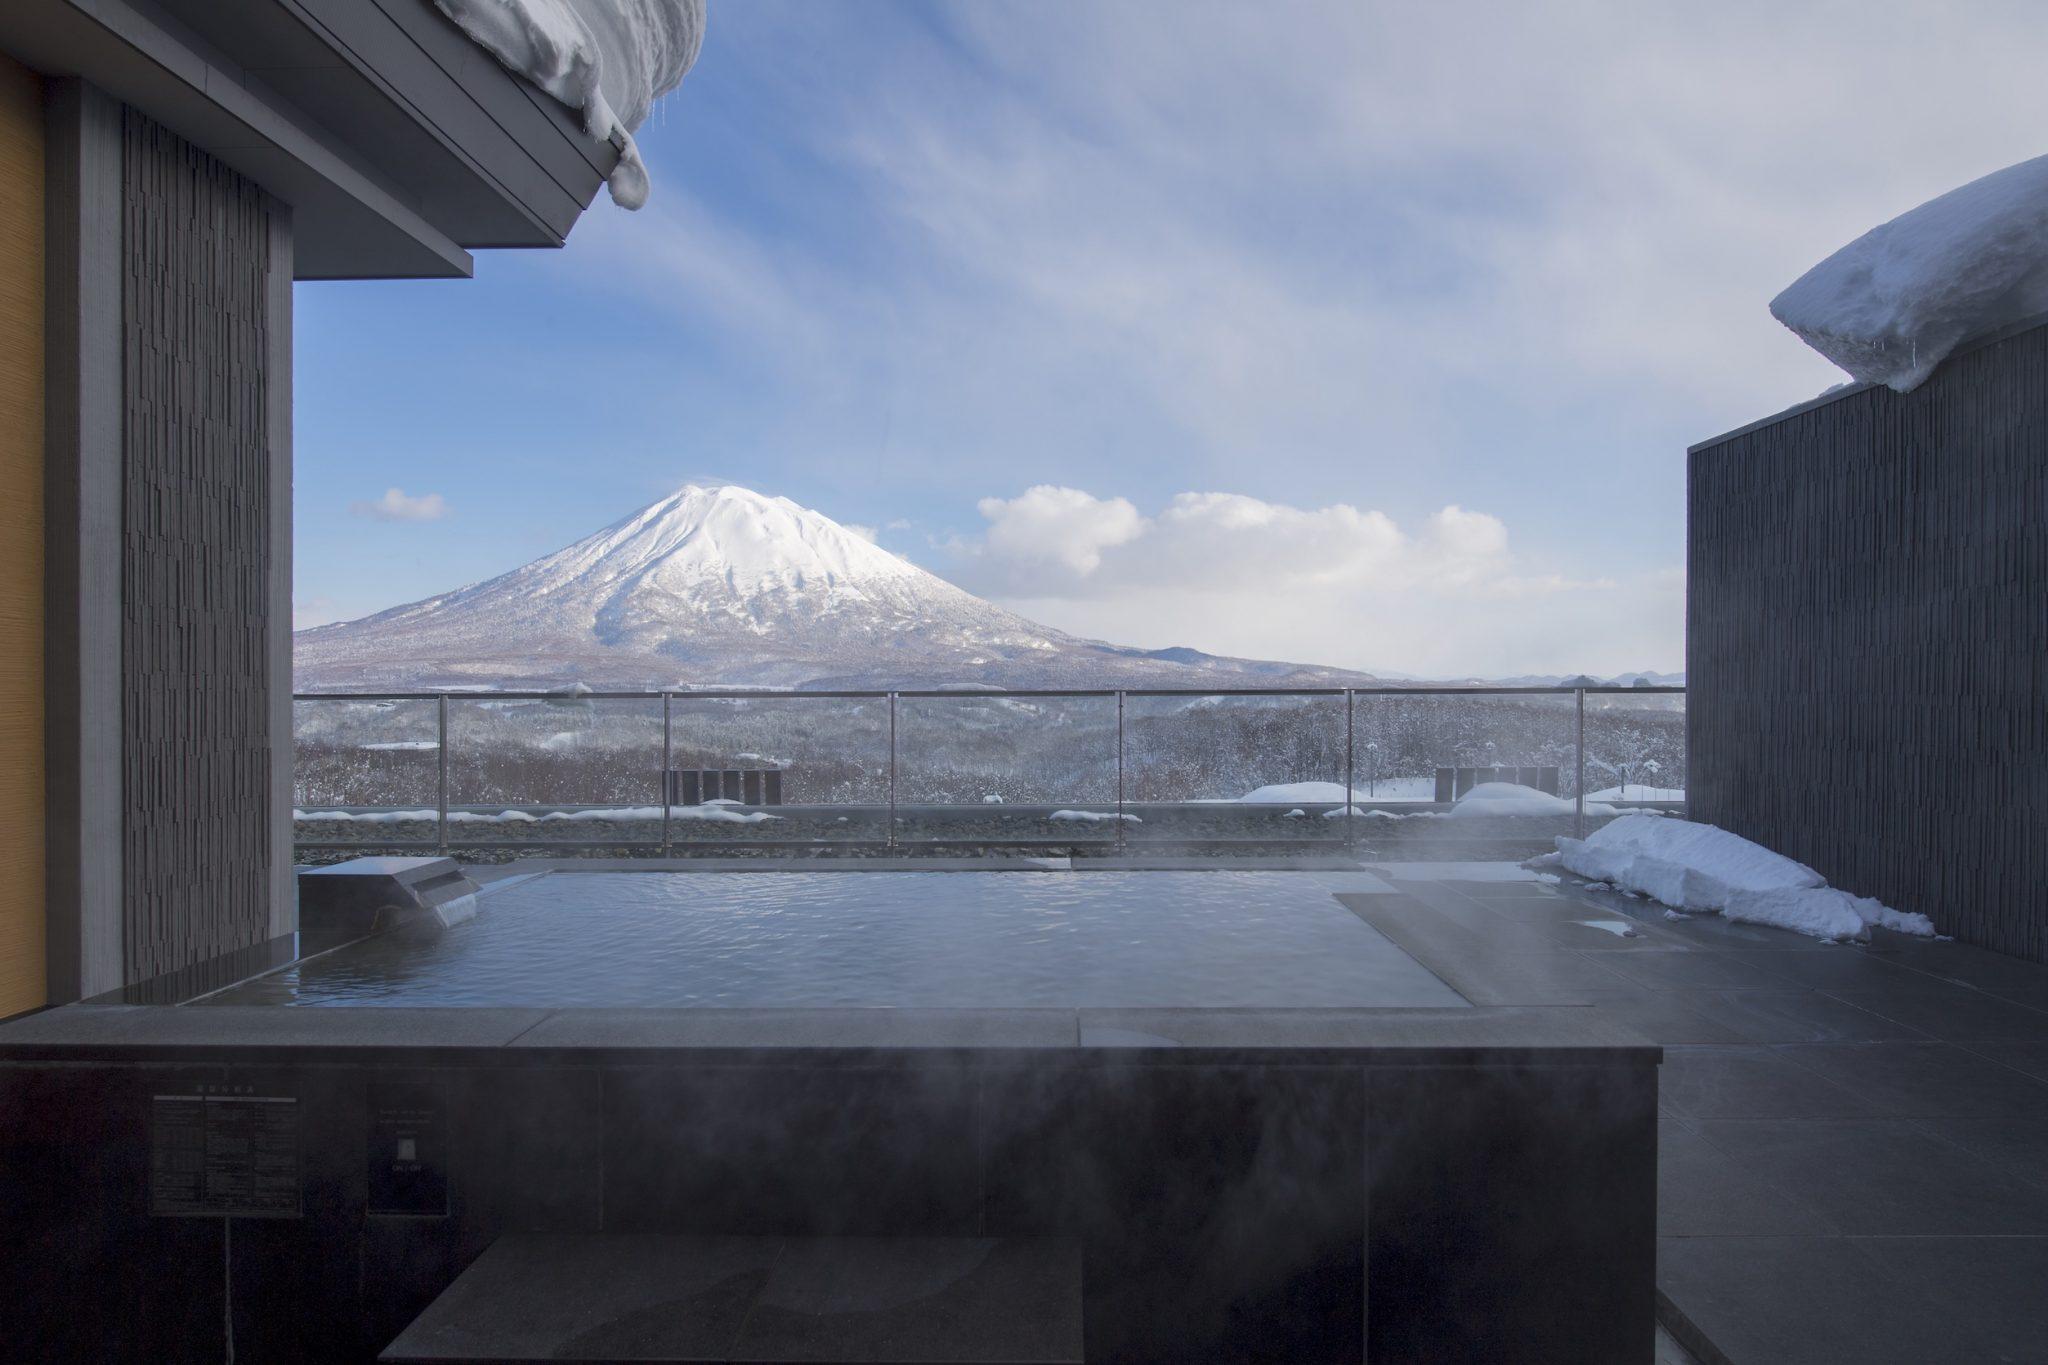 aya-niseko-penthouse-a-winter-3